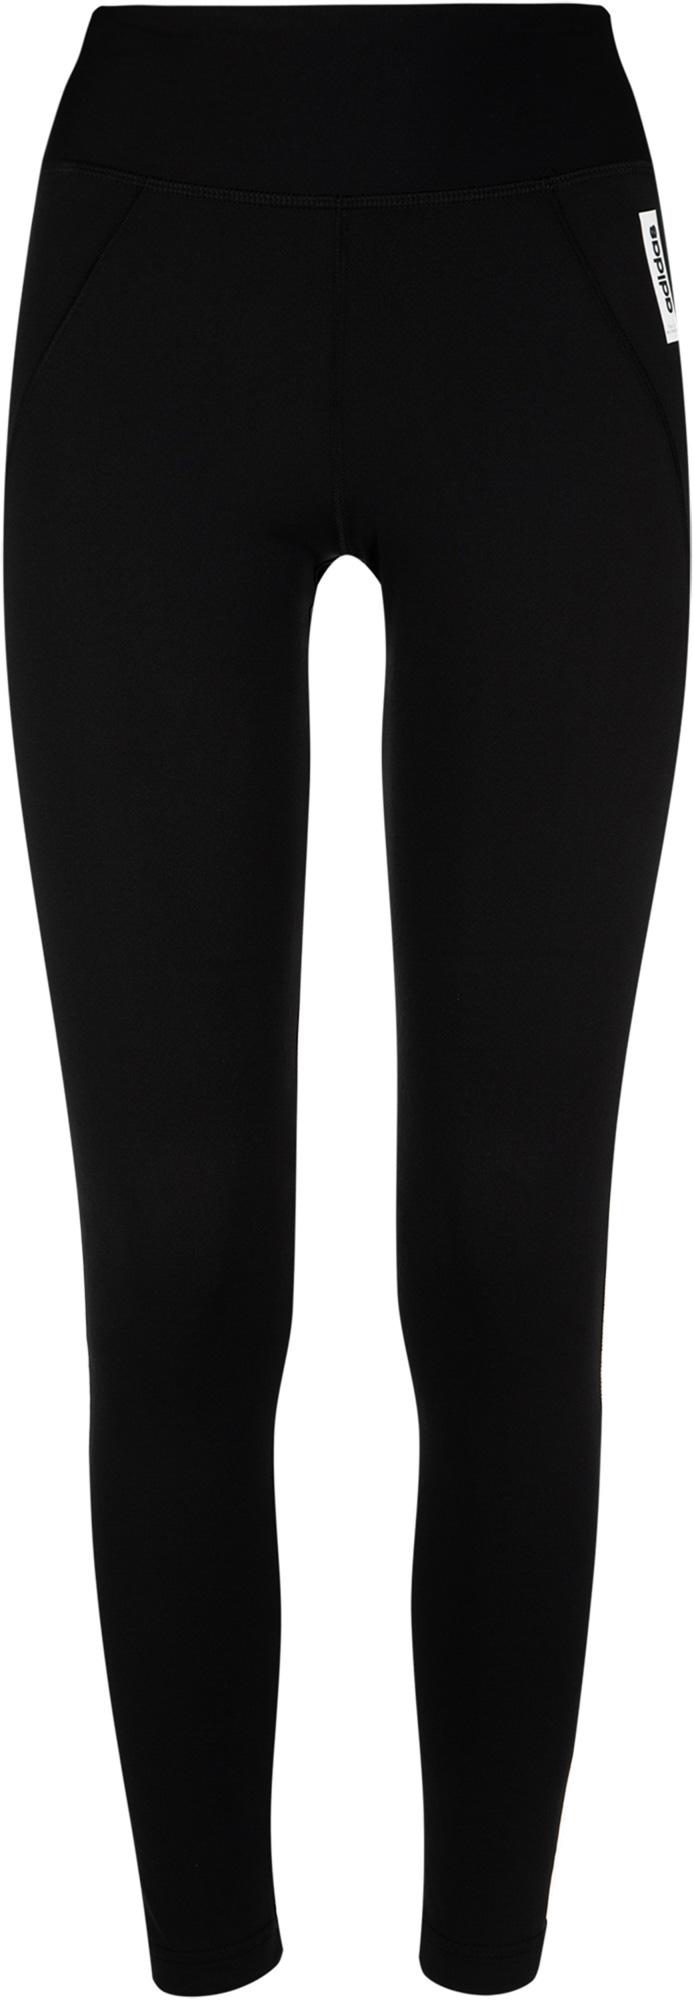 Adidas Легинсы женские Adidas Brilliant Basic, размер 46-48 легинсы для фитнеса и кардиотренировок женские 500